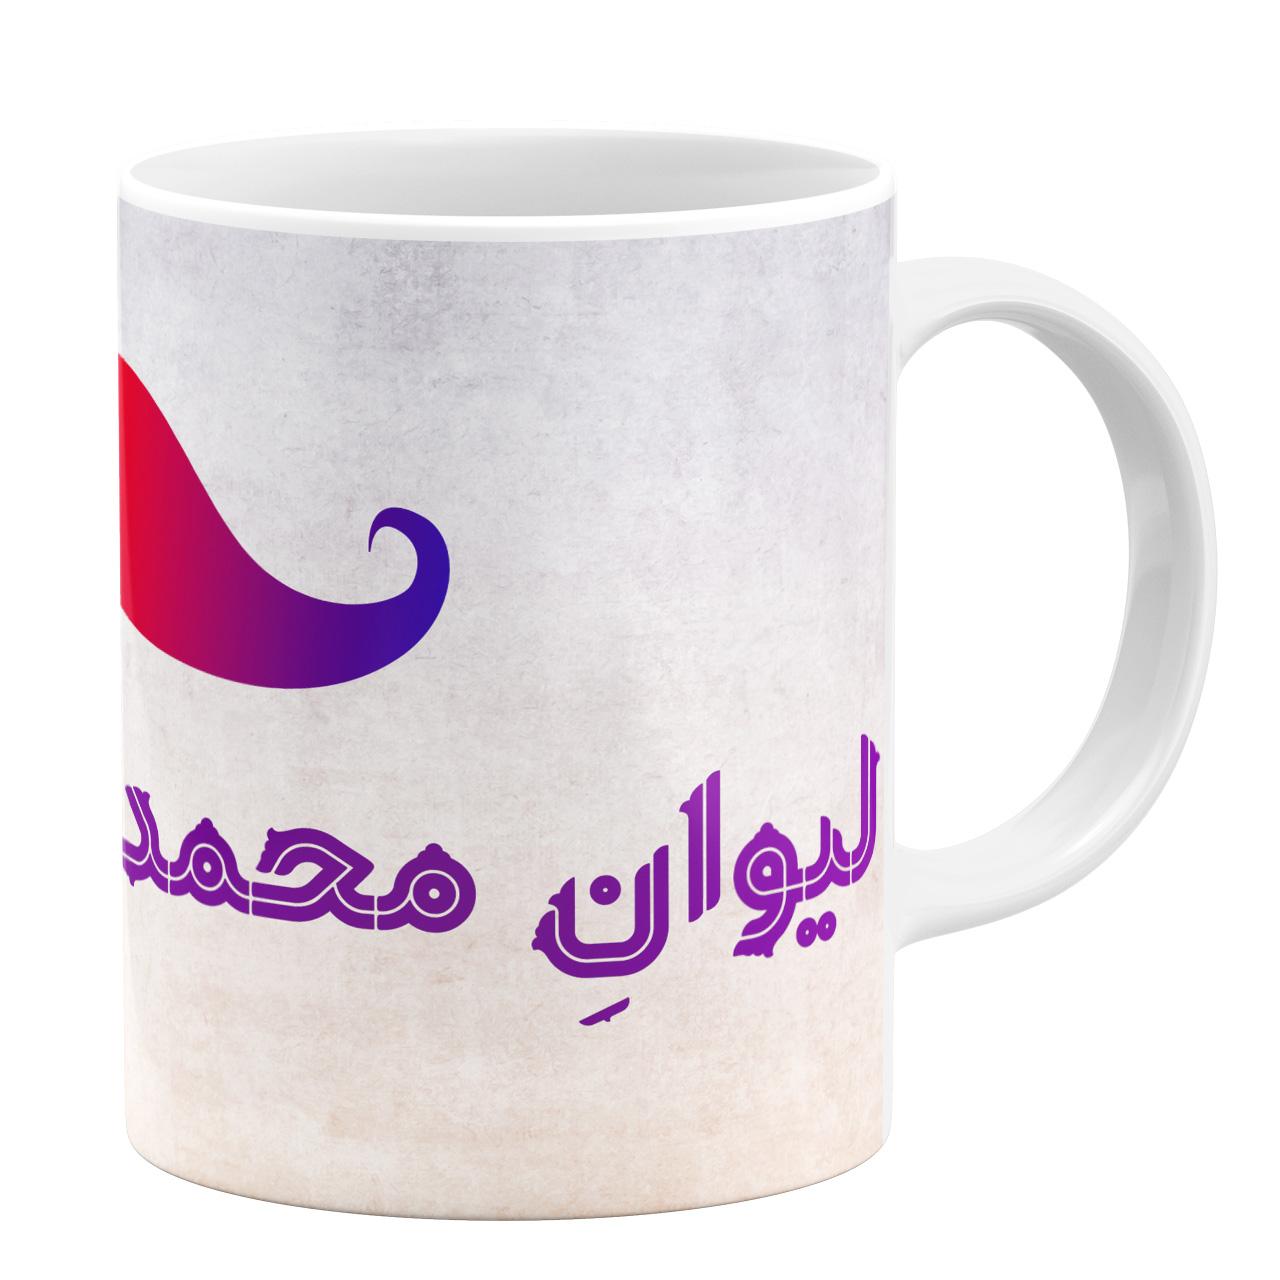 ماگ طرح لیوان محمد آقا کد 11054094143